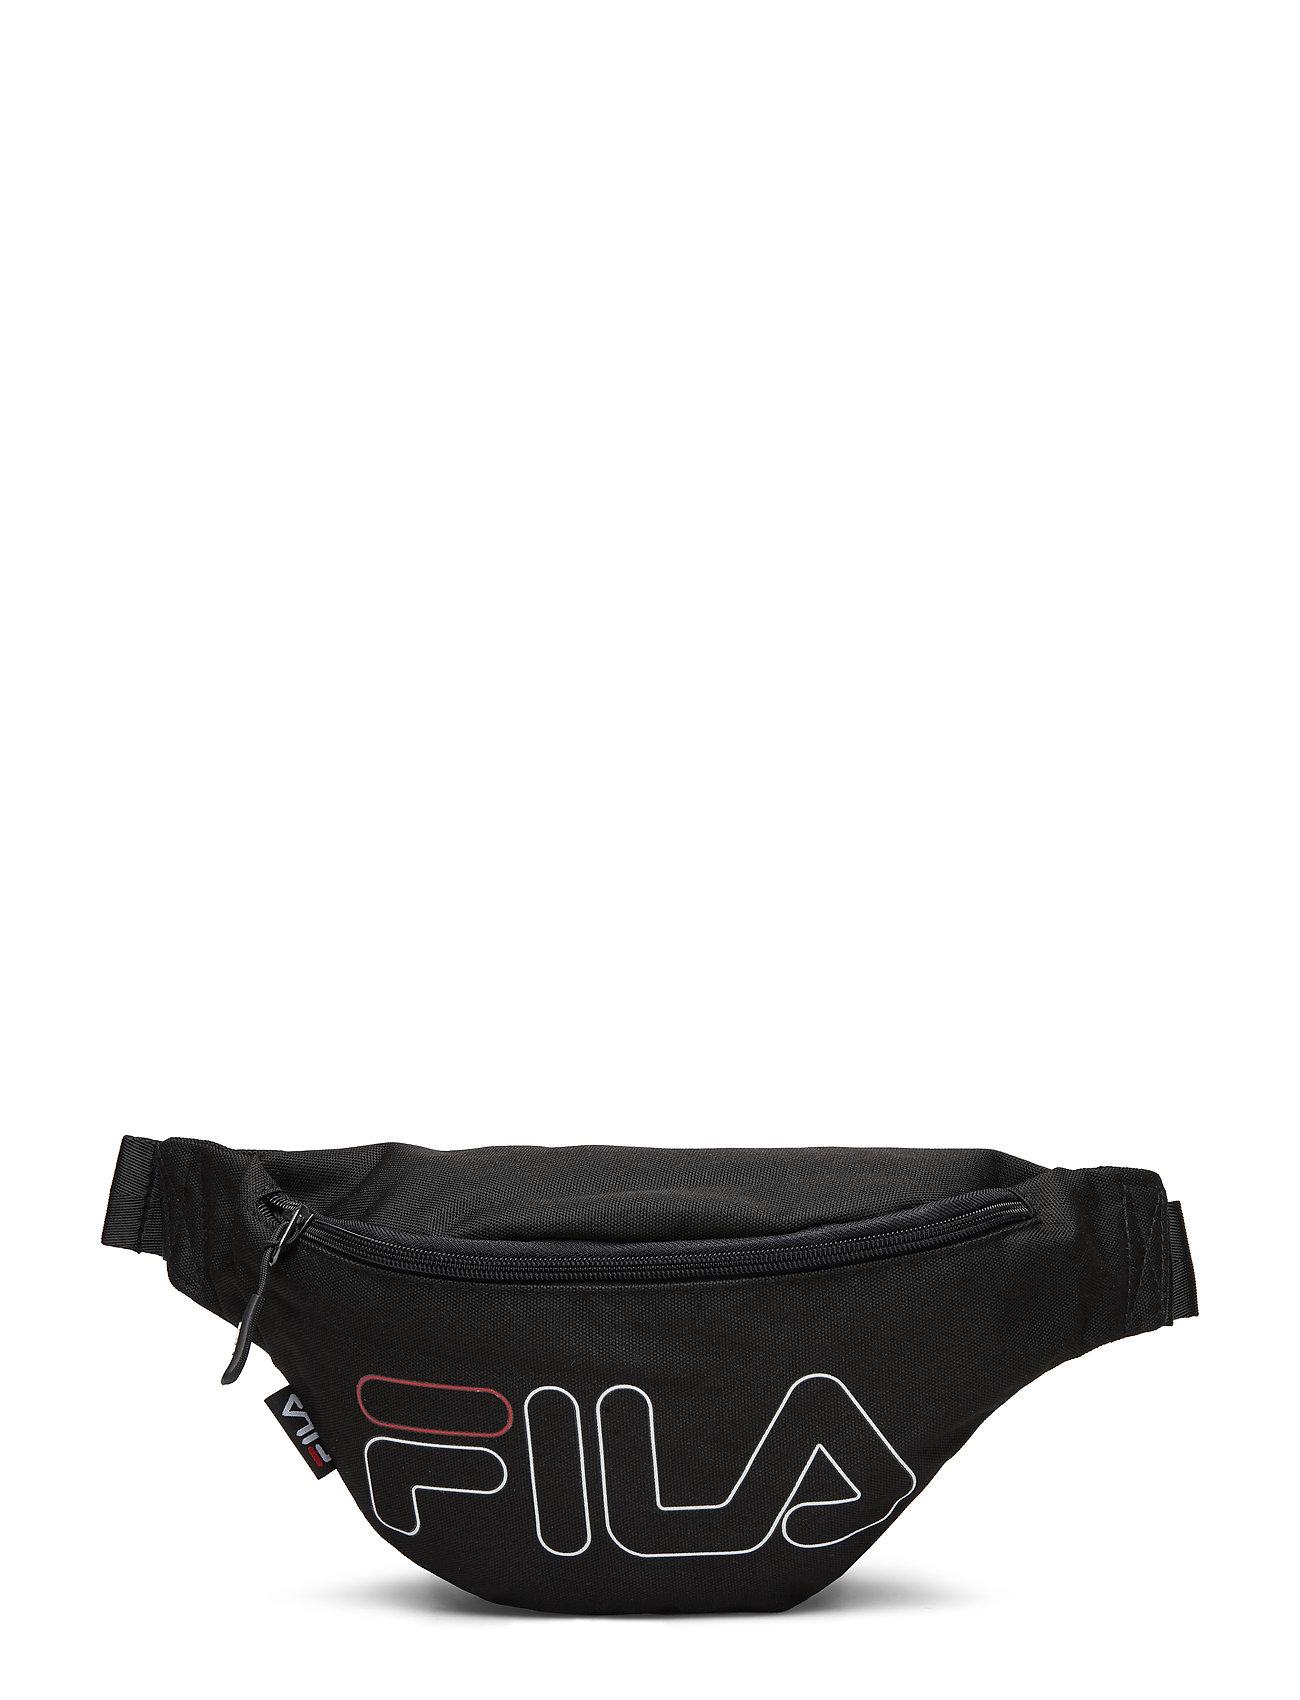 FILA Waist Bag Slim Bum Bag Tasche Schwarz FILA